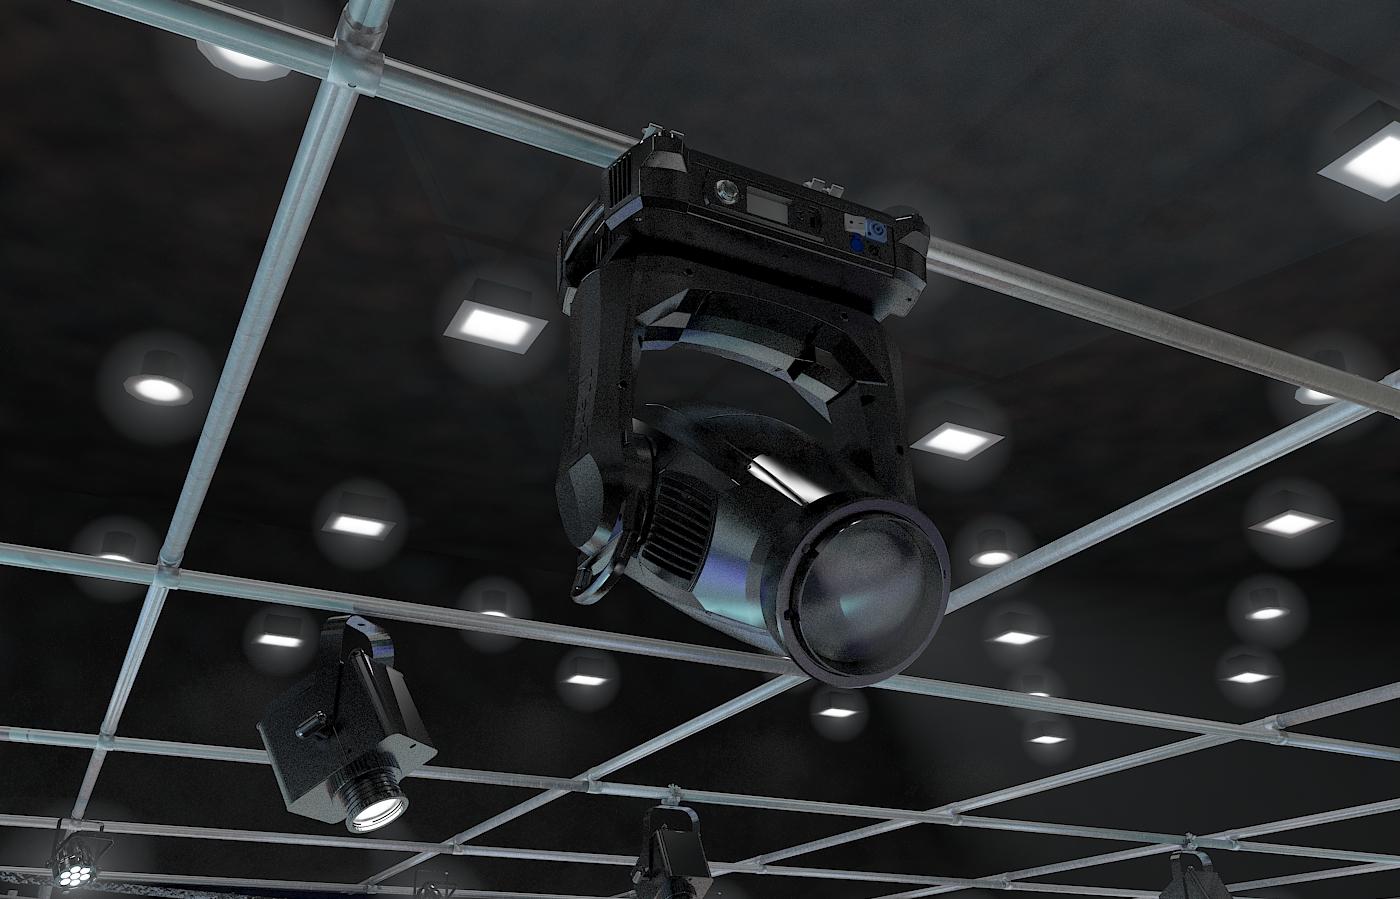 виртуал телевизийн студи цуглуулга vol 6 3d загвар max dxf dwg fbx obj 223411